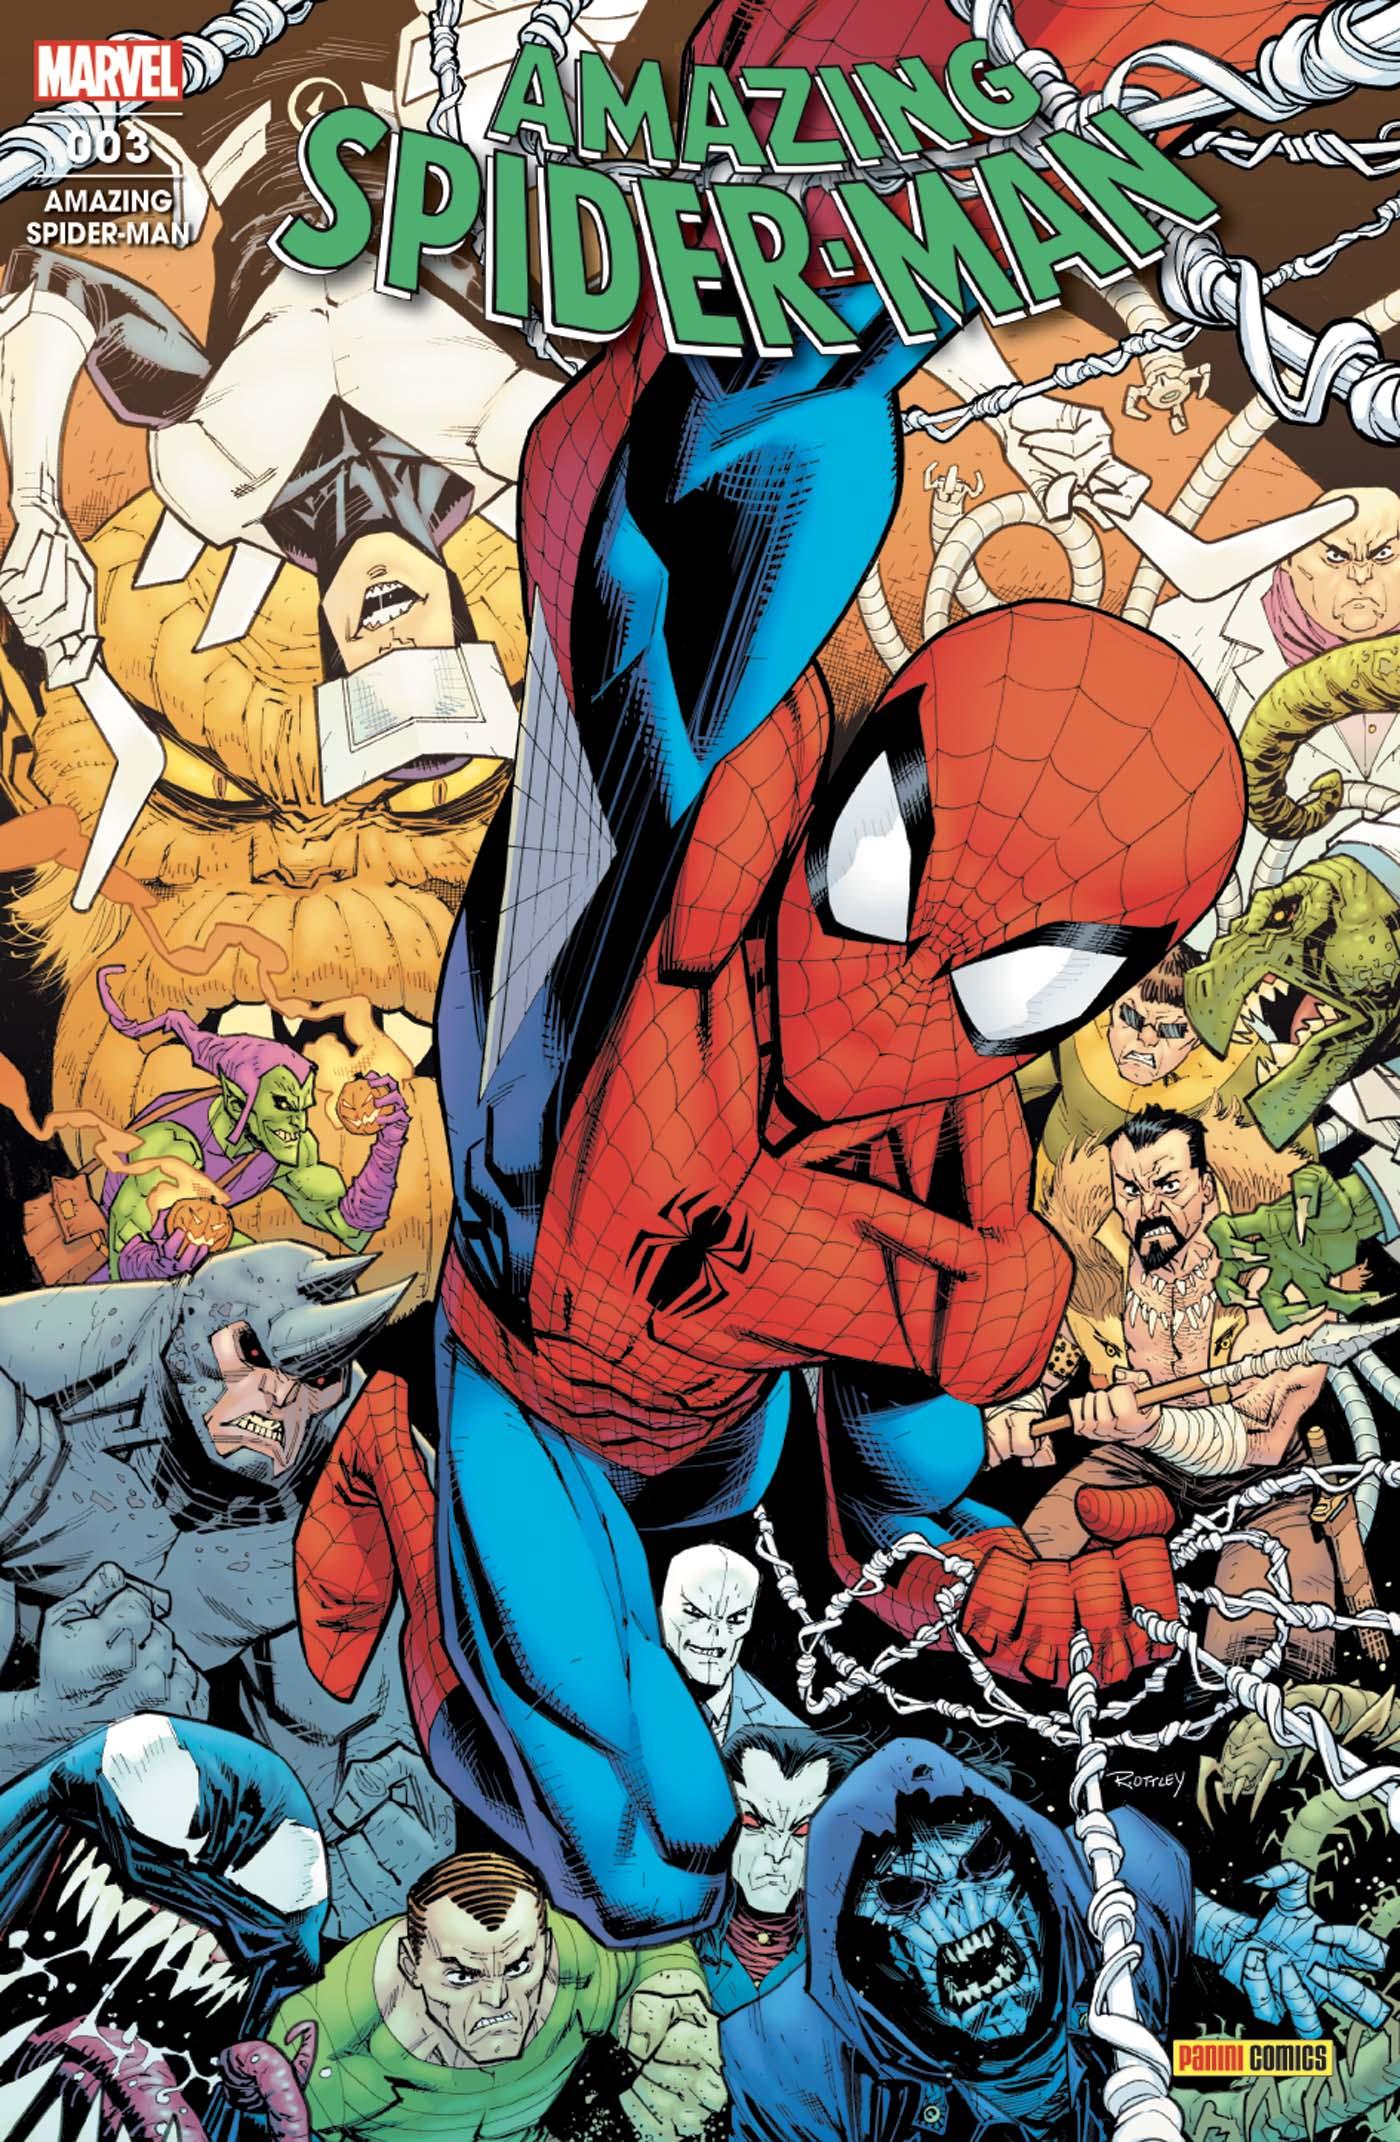 AMAZING SPIDER-MAN 2 (VF)